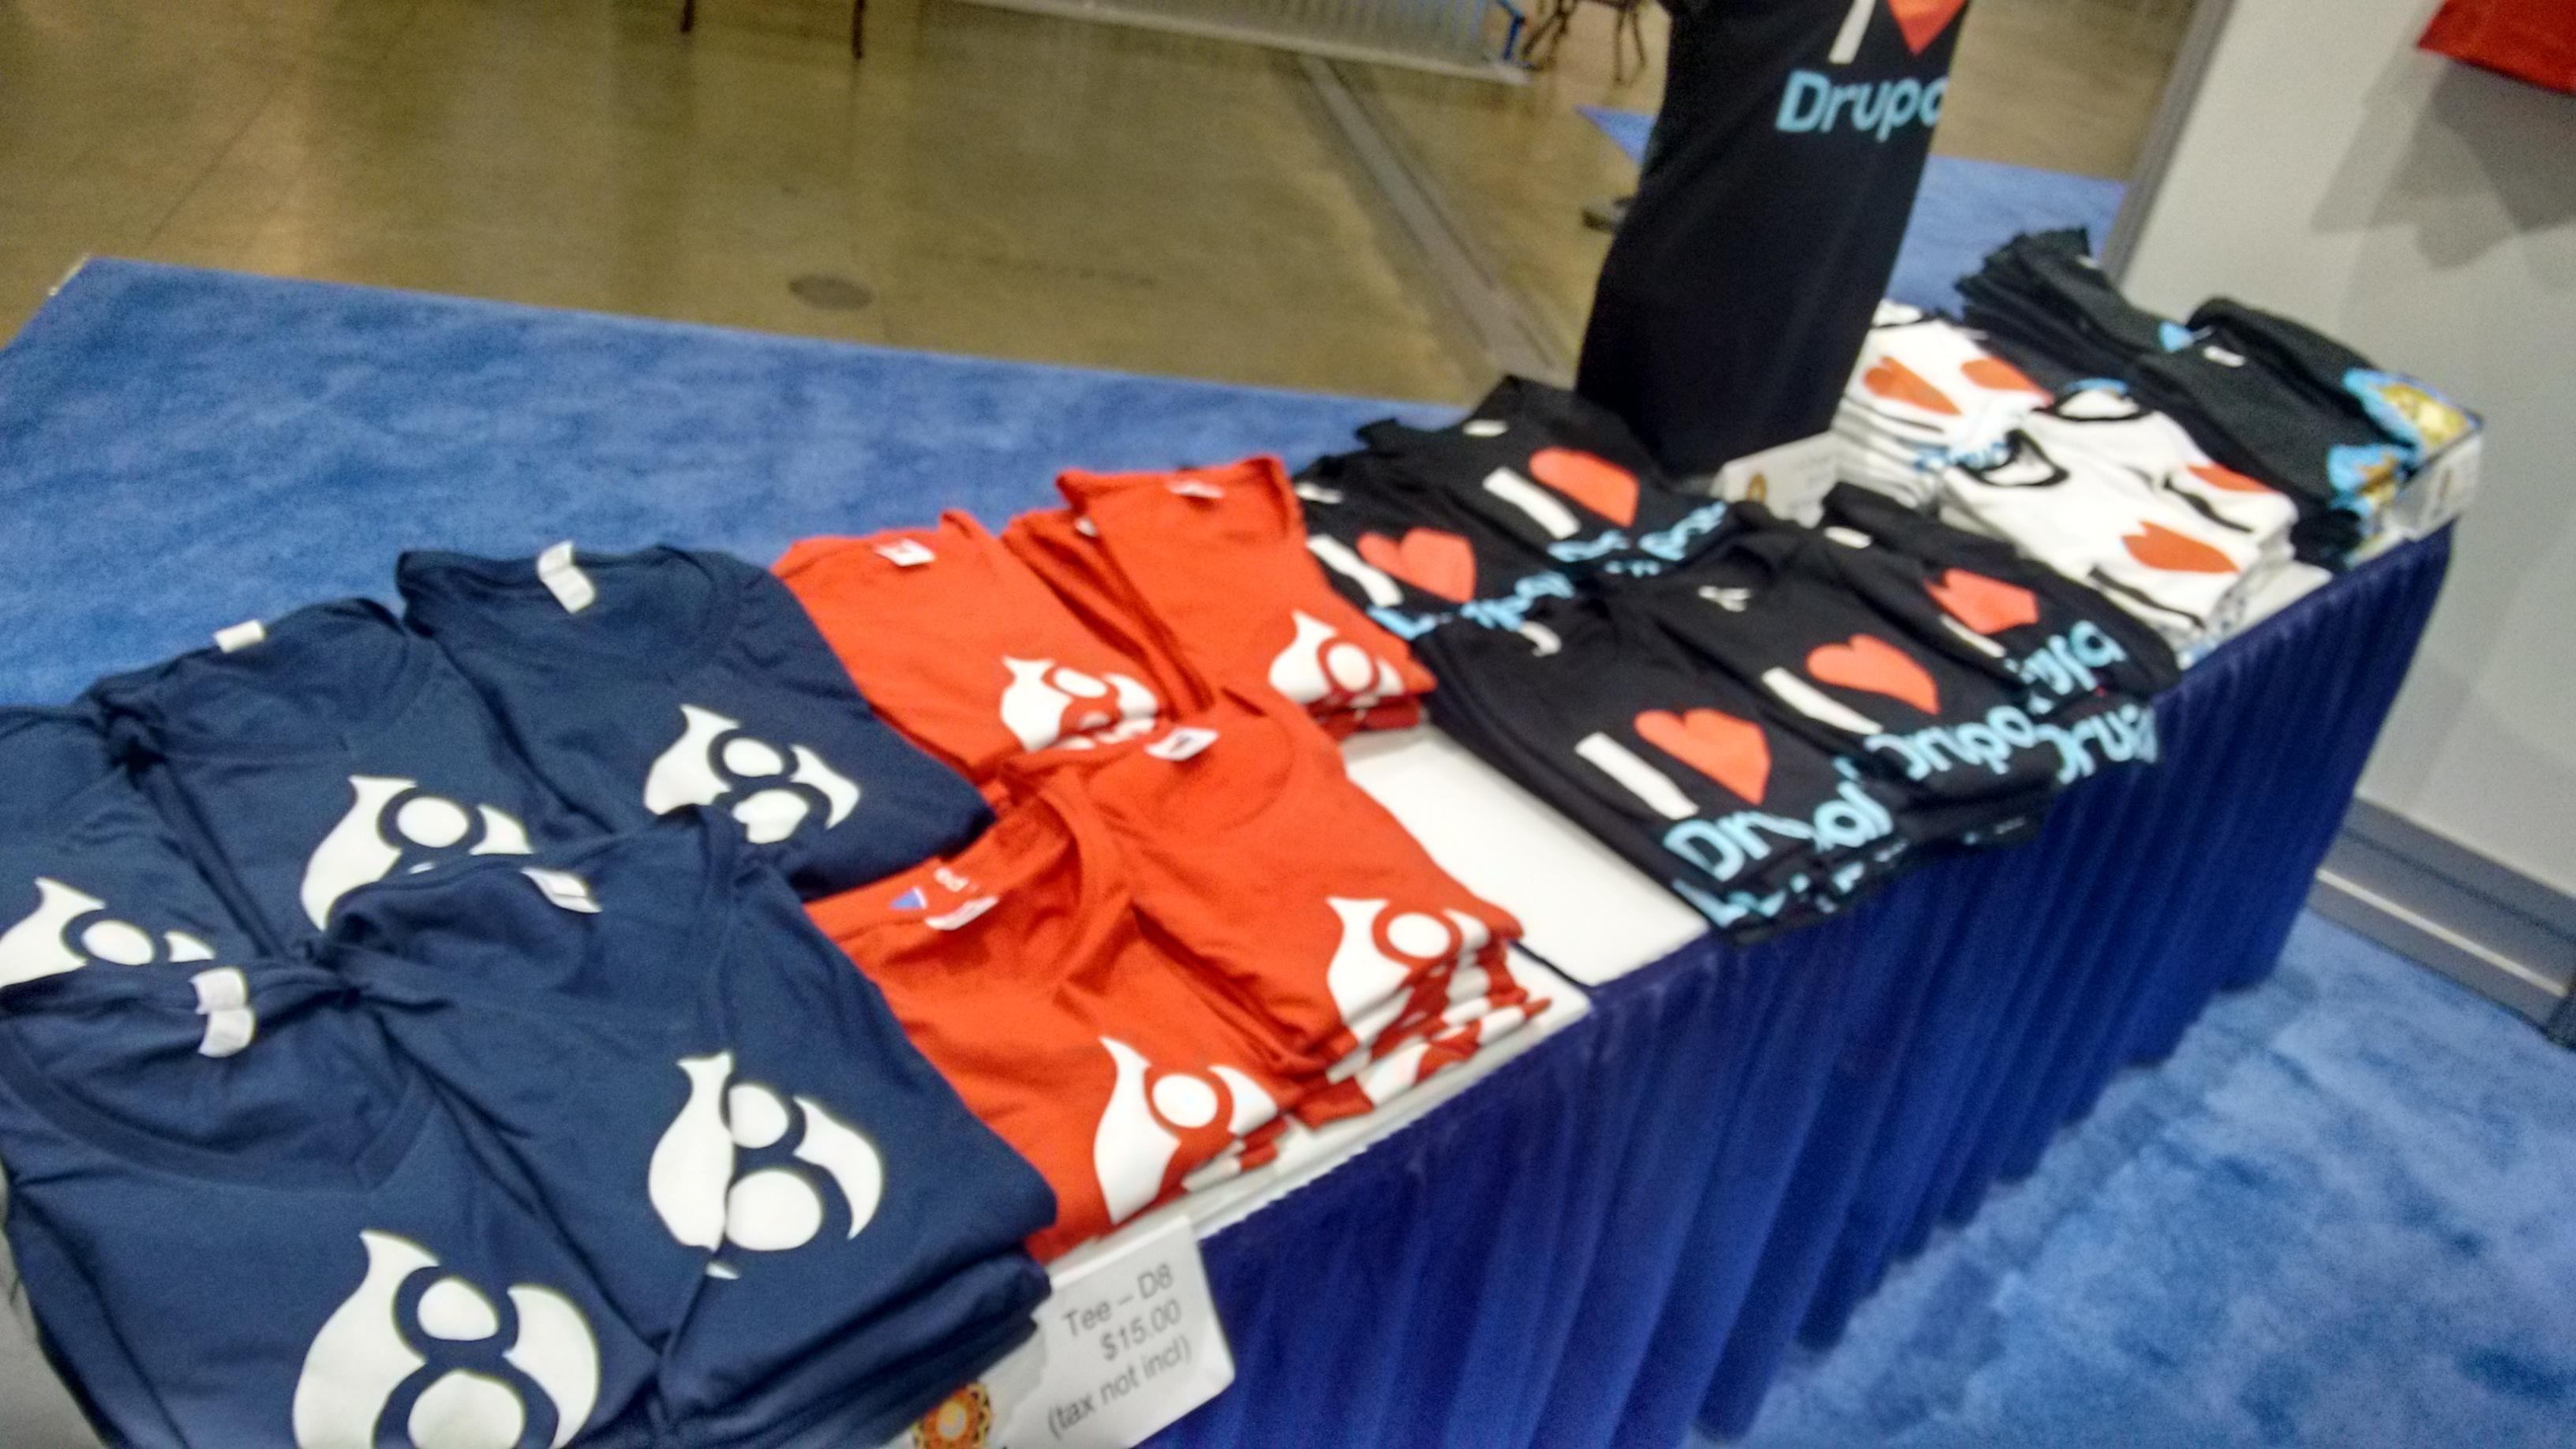 Drupal 8 t-shirts